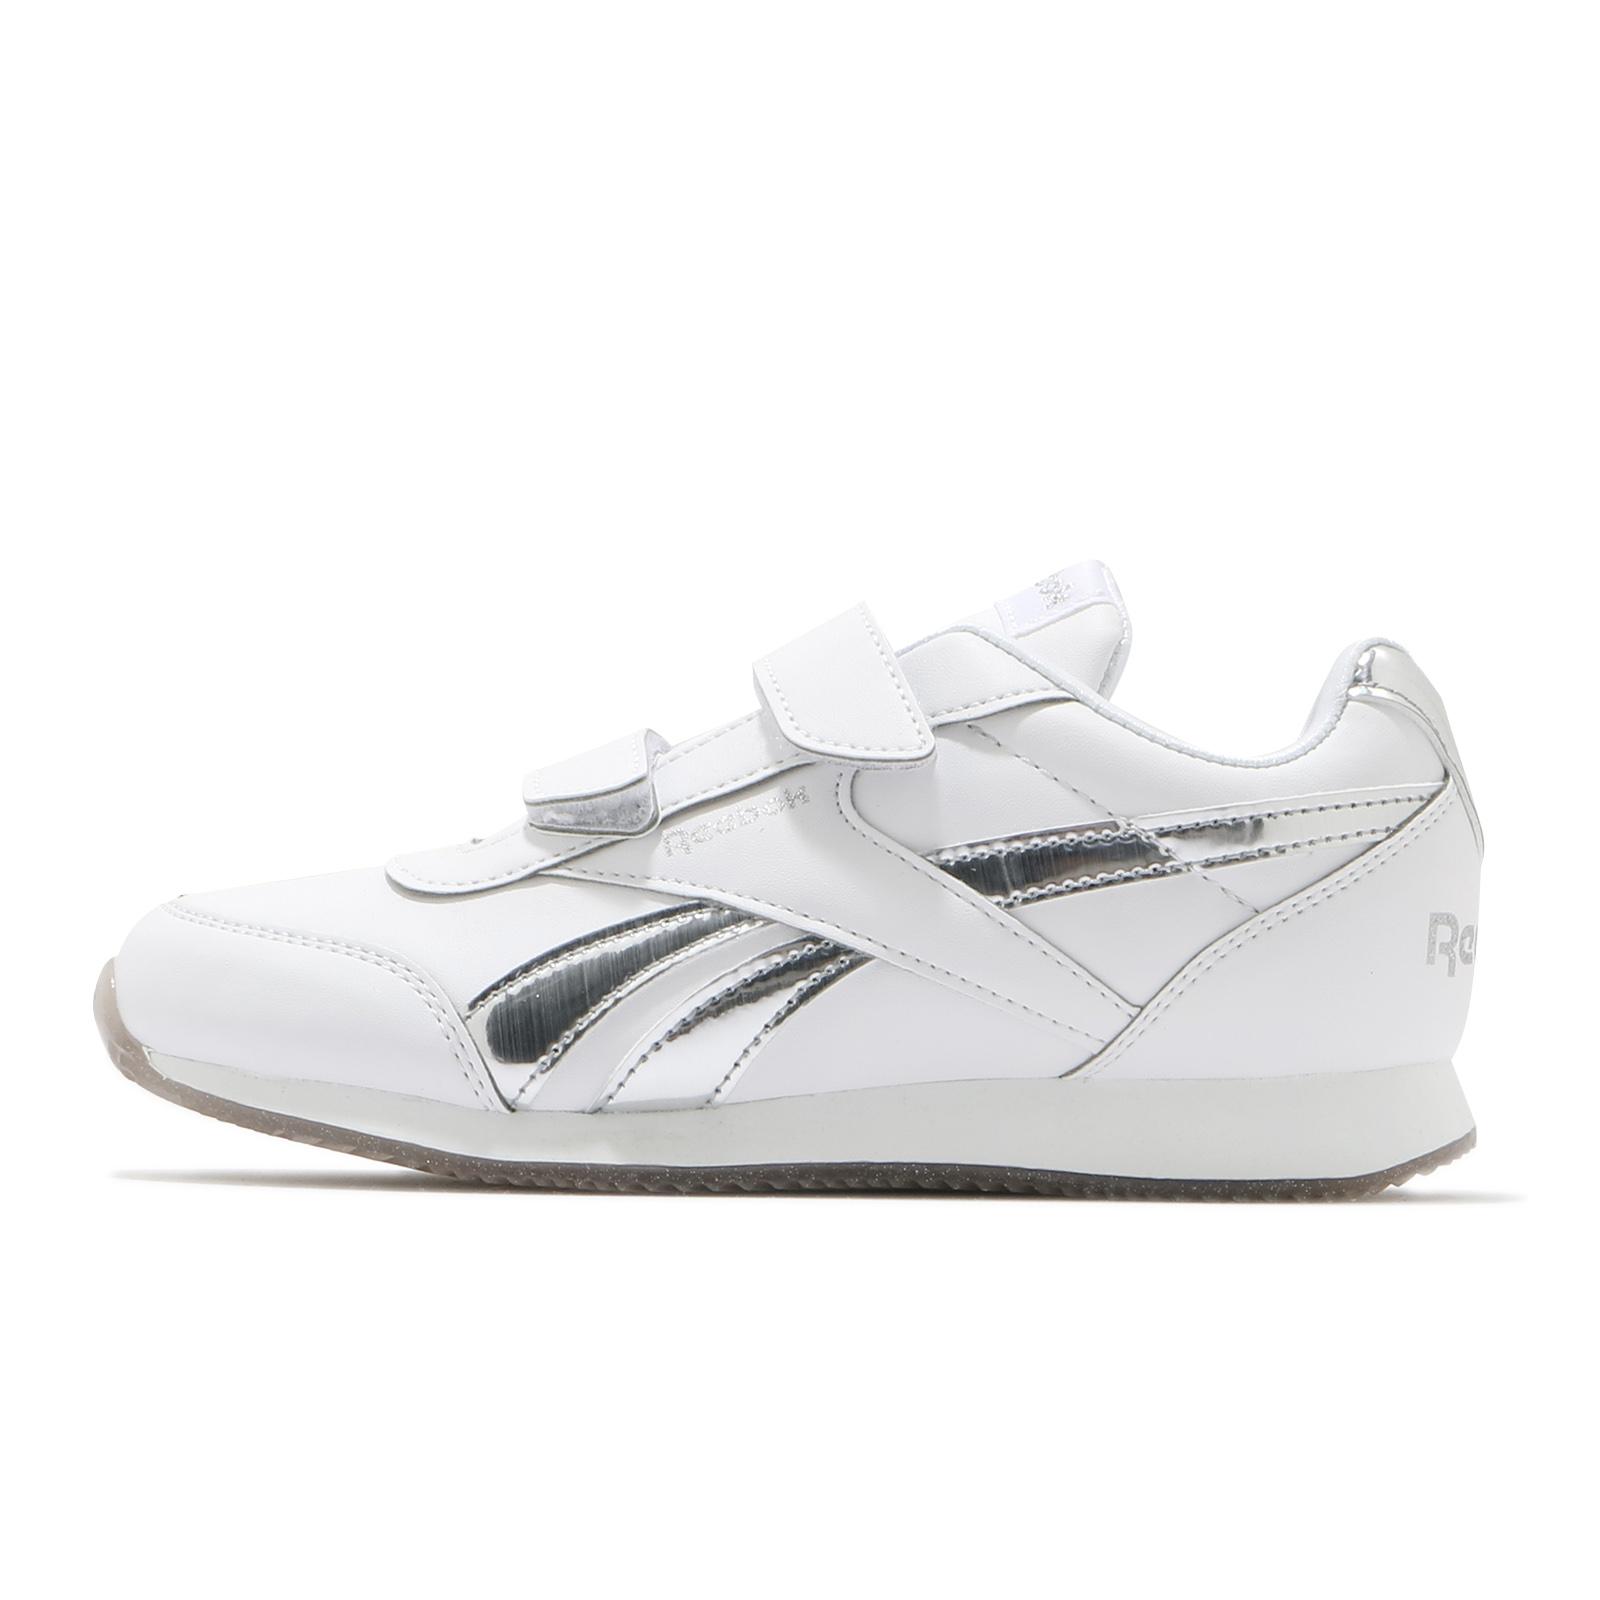 Reebok 童鞋 Royal CLJOG 2.0 2V 白 銀 魔鬼氈 中童鞋 小朋友【ACS】 FV1525